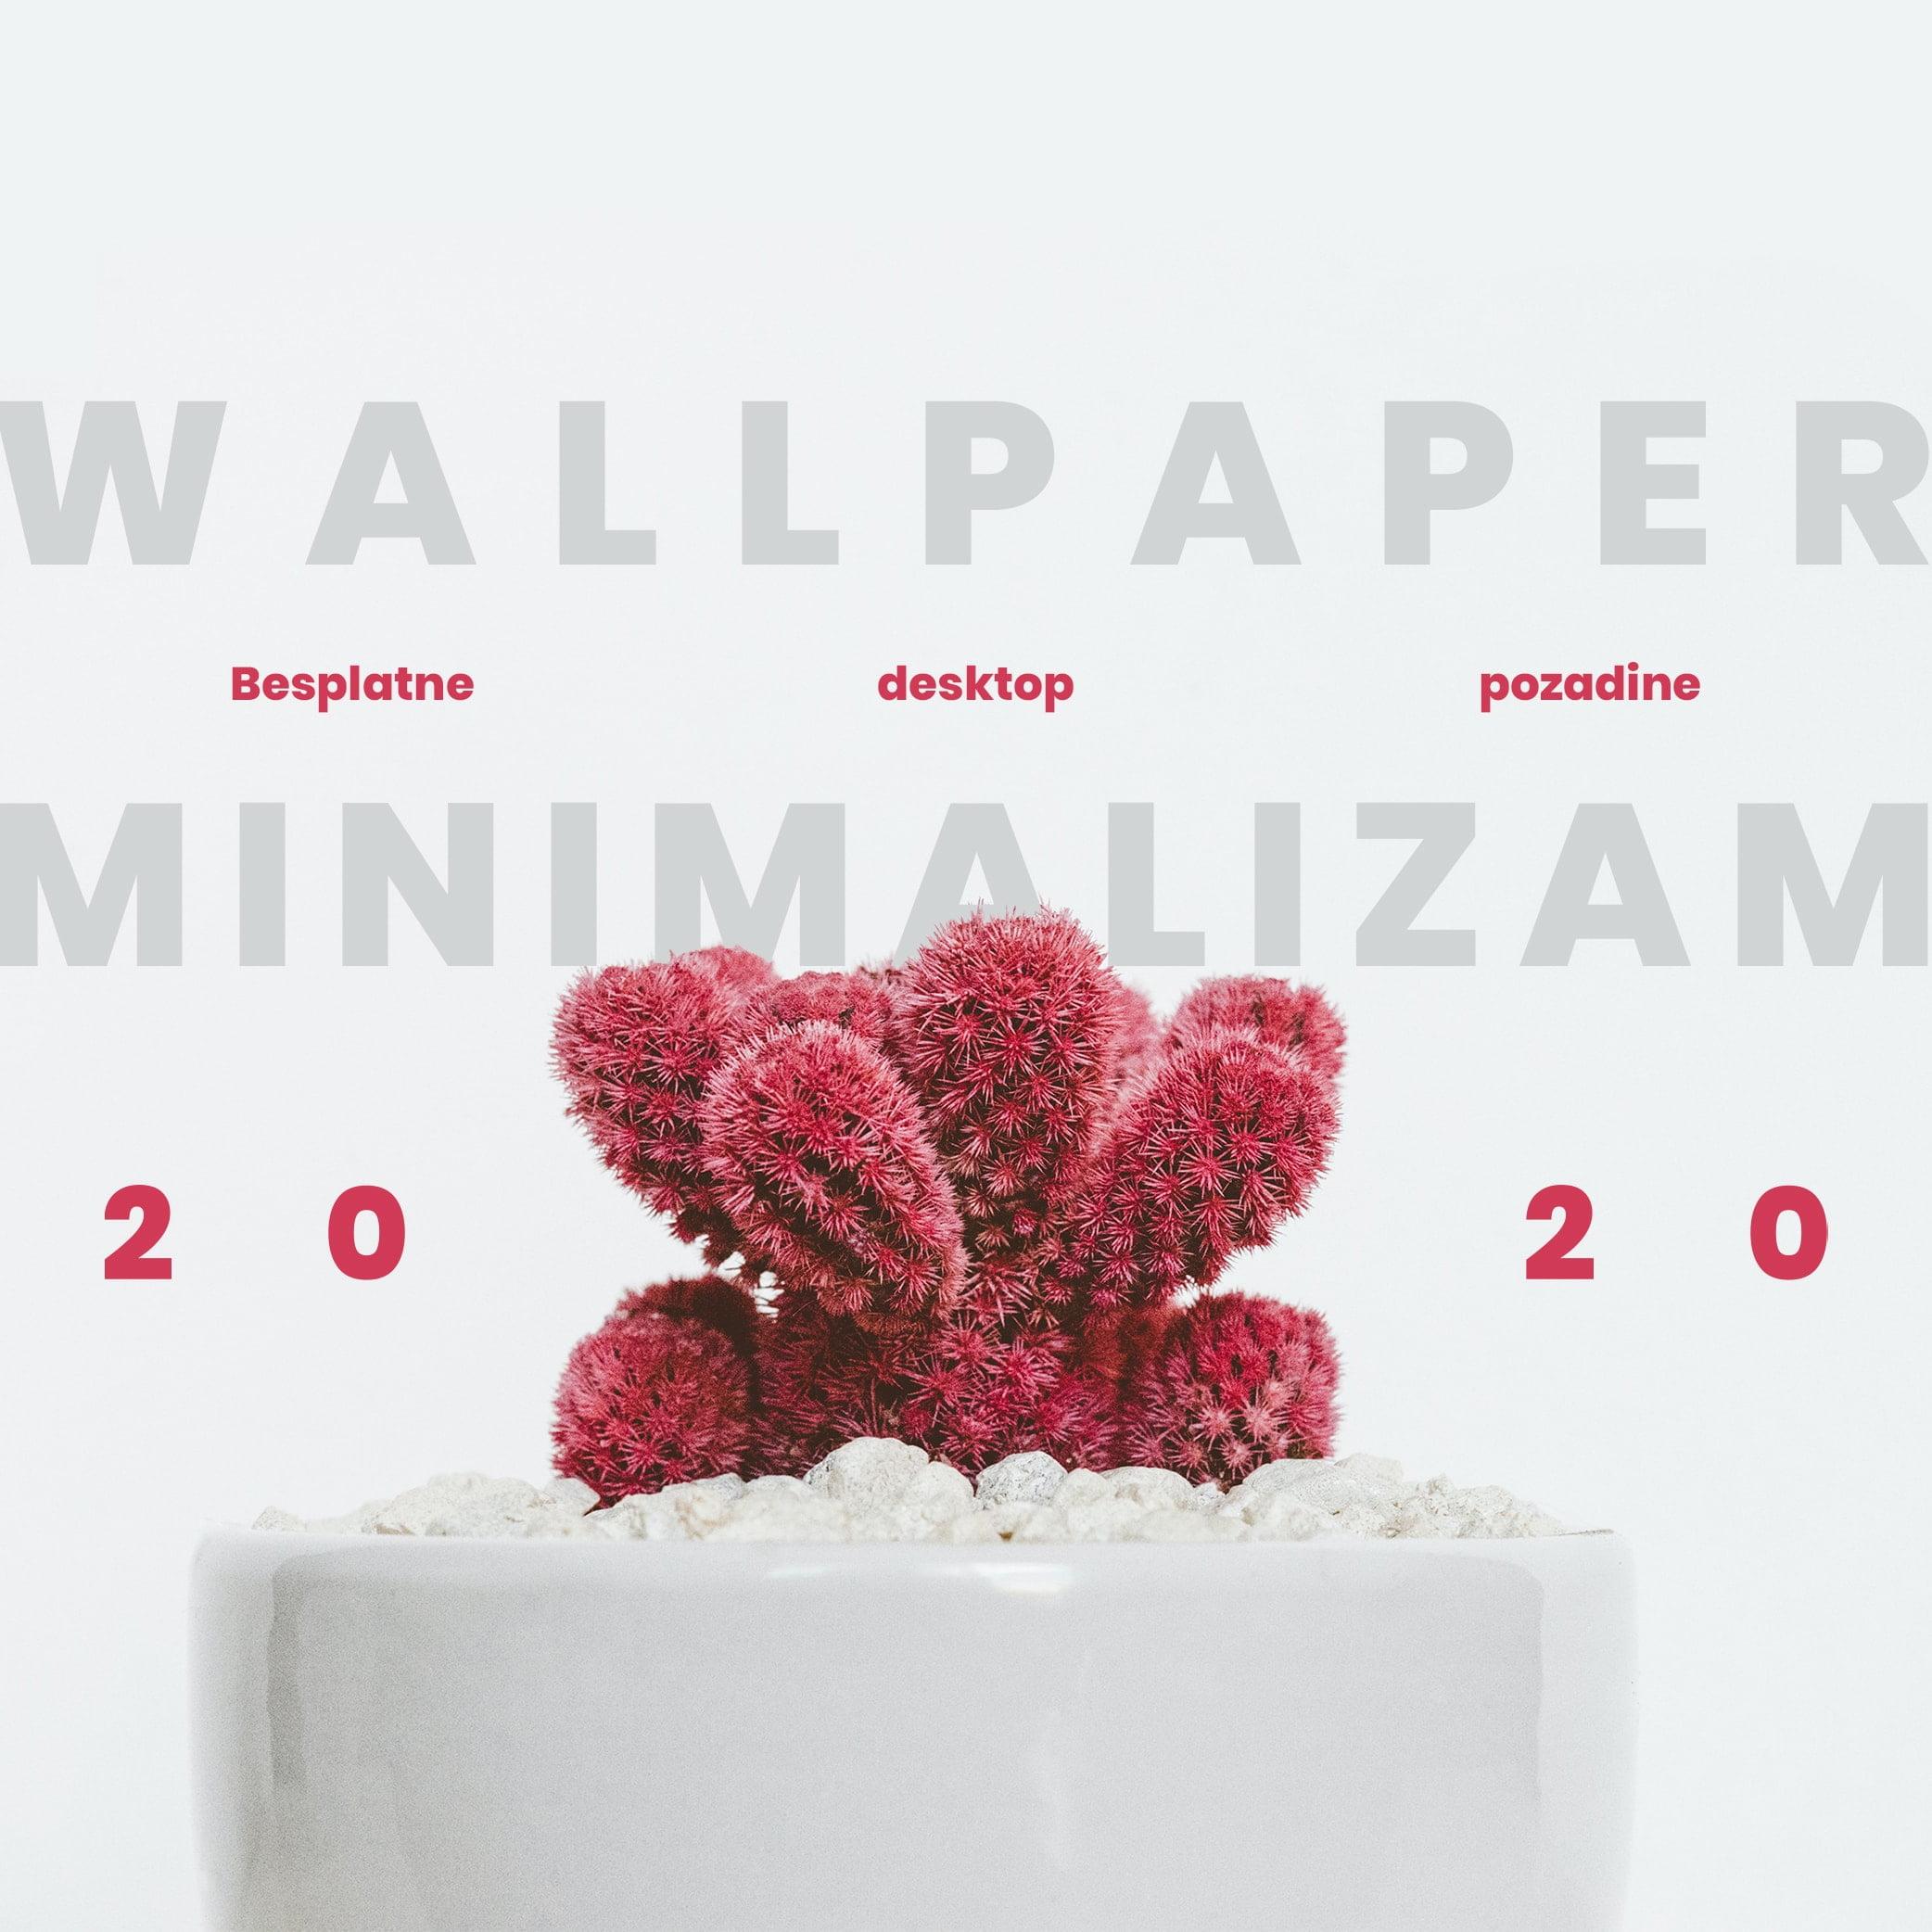 Wallpaper minimalizam – Besplatne desktop pozadine za 2020.